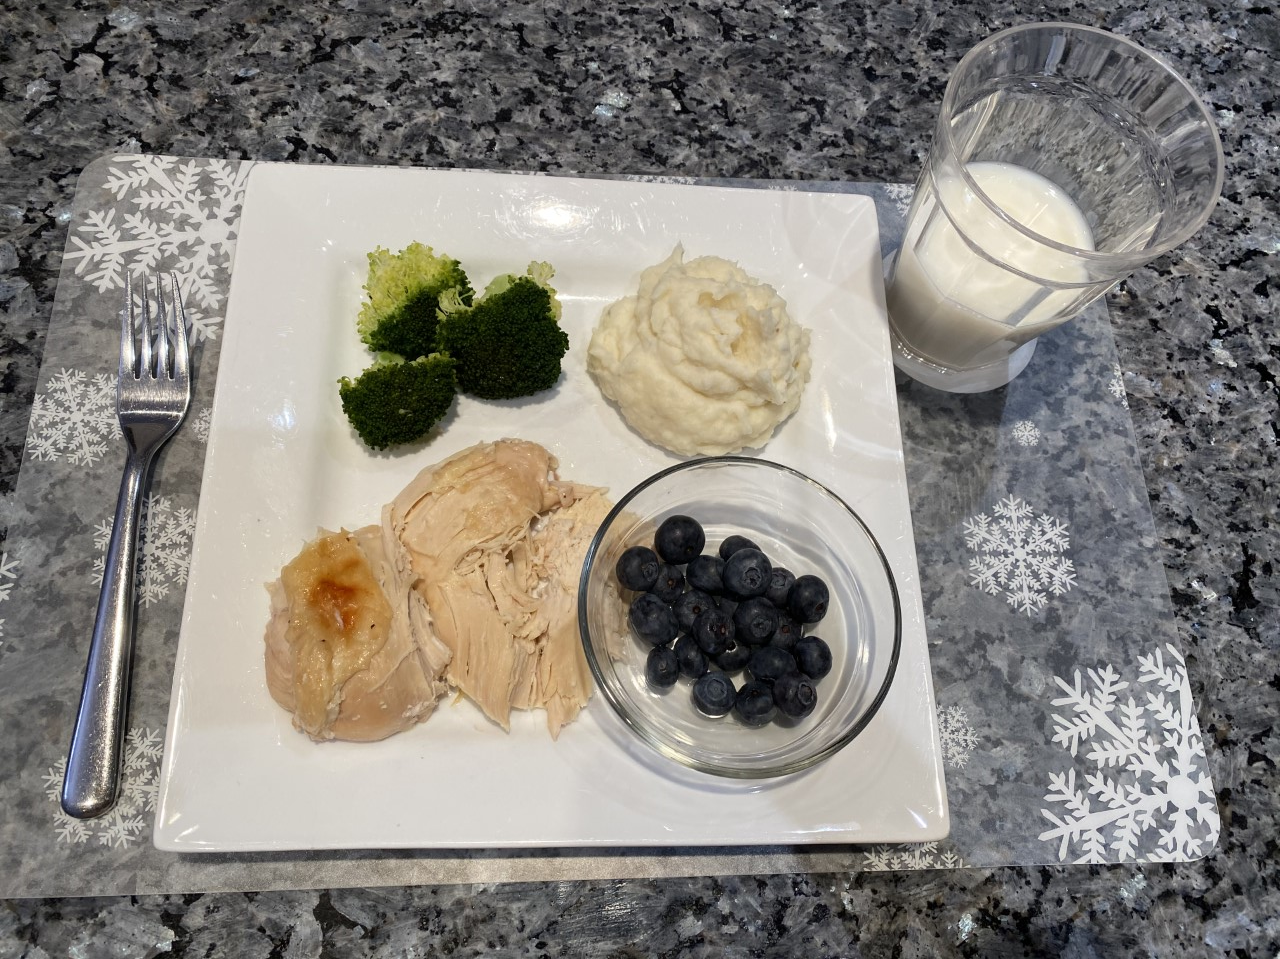 Turkey, broccoli, potatoes, blueberries, milk